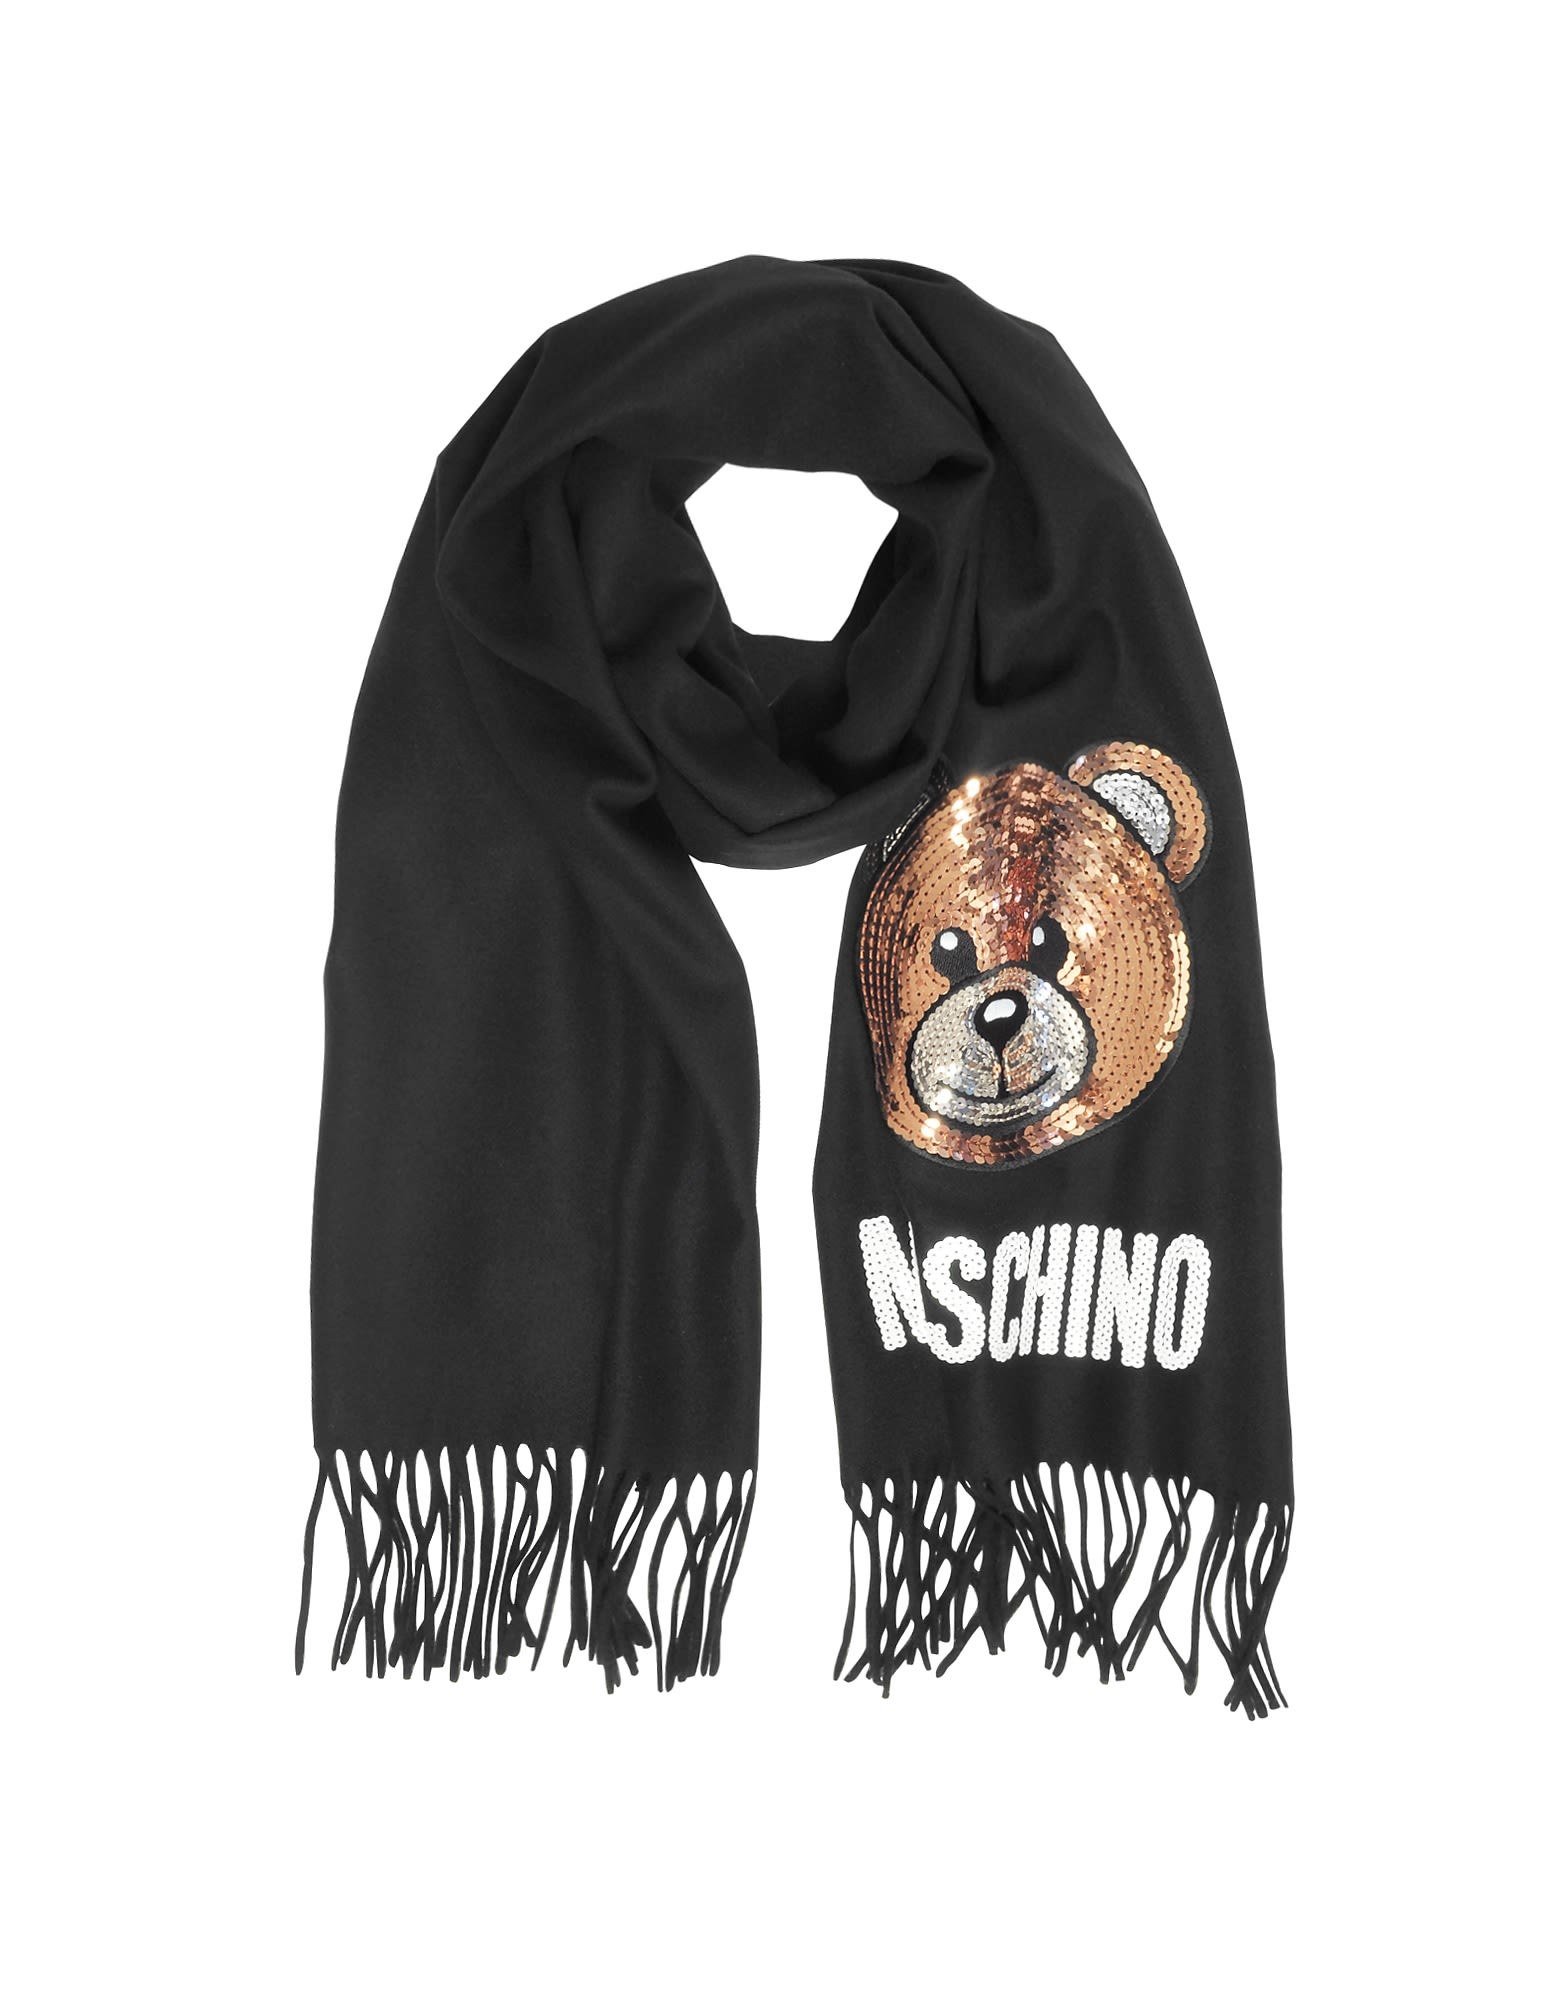 MOSCHINO SEQUIN TEDDY BEAR FRINGED WOOL SCARF